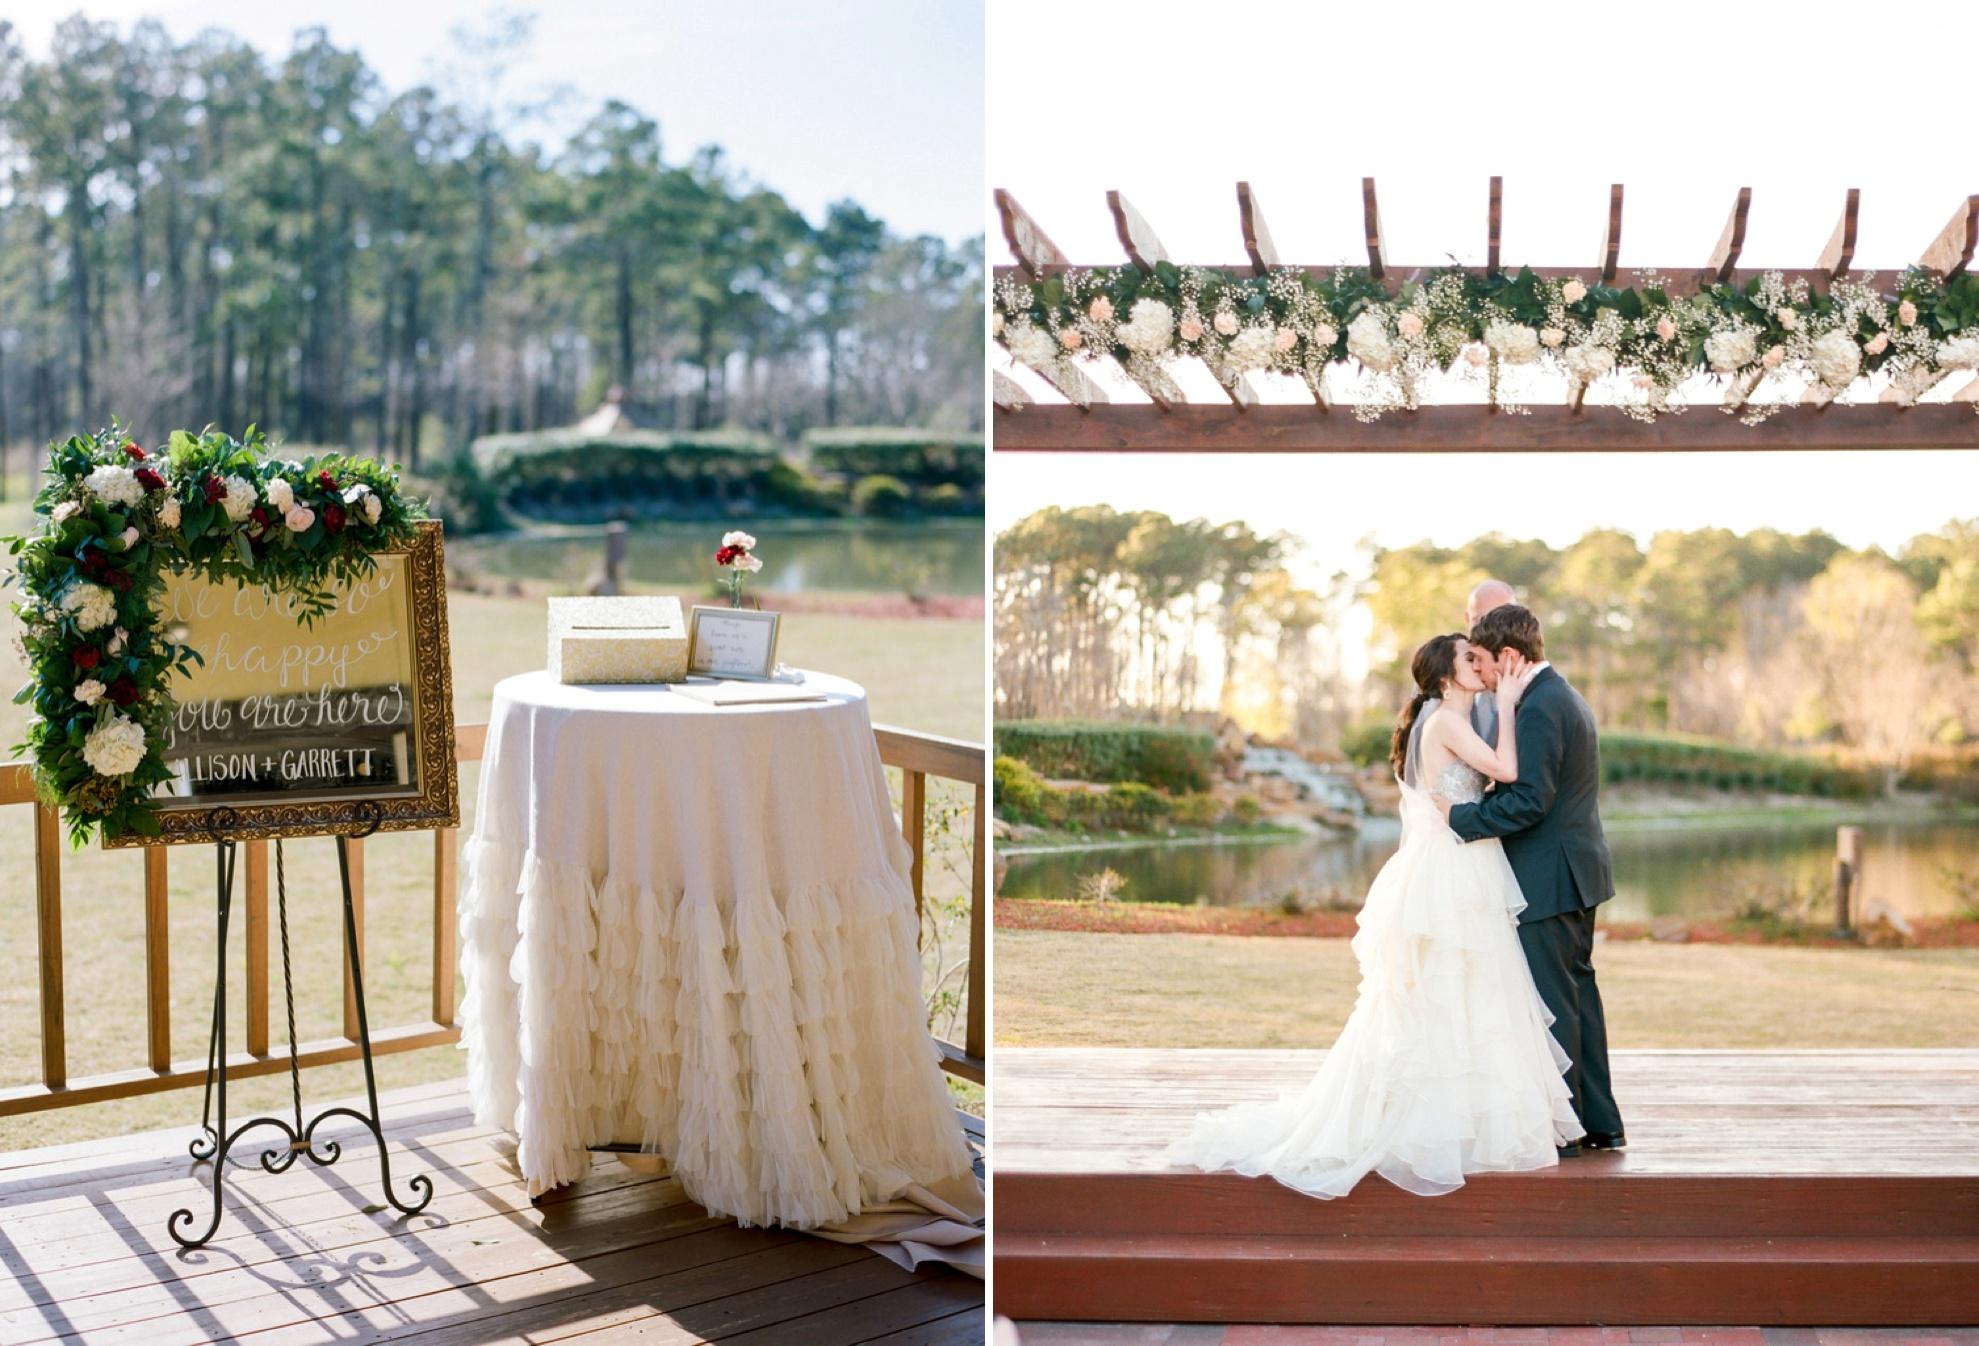 Tuscan-Courtyard-Wedding-Venue-Texas-City-Ceremony-Reception-Photographer-Dana-Fernandez-Photography-2.jpg